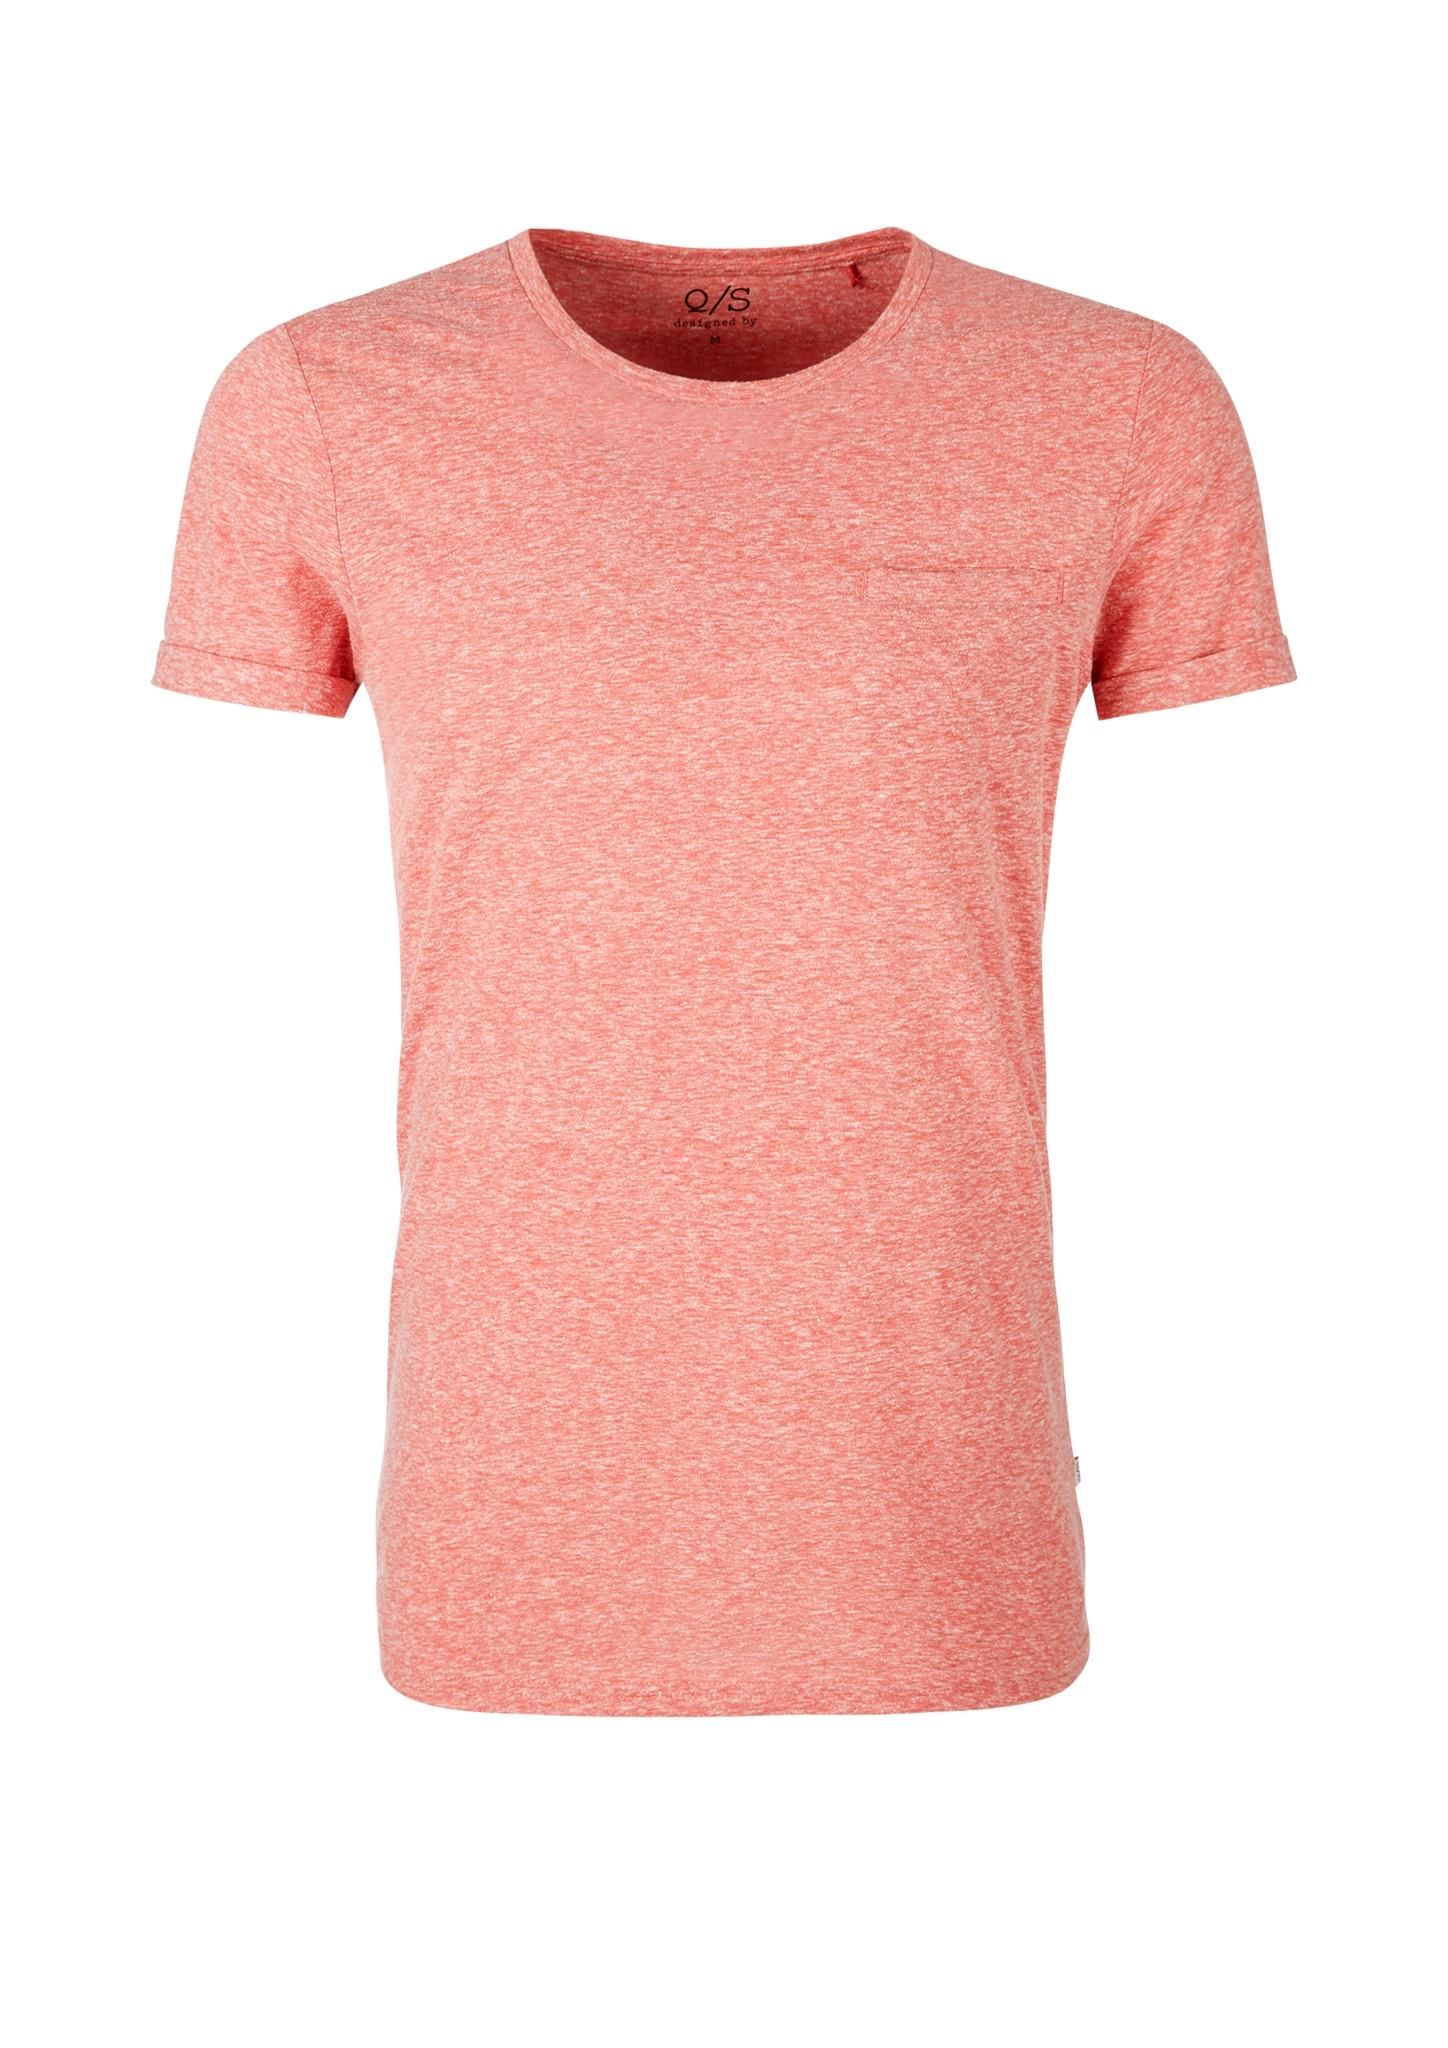 T-Shirt | Bekleidung > Shirts | Orange | 50% polyester -  38% baumwolle -  12% viskose | Q/S designed by